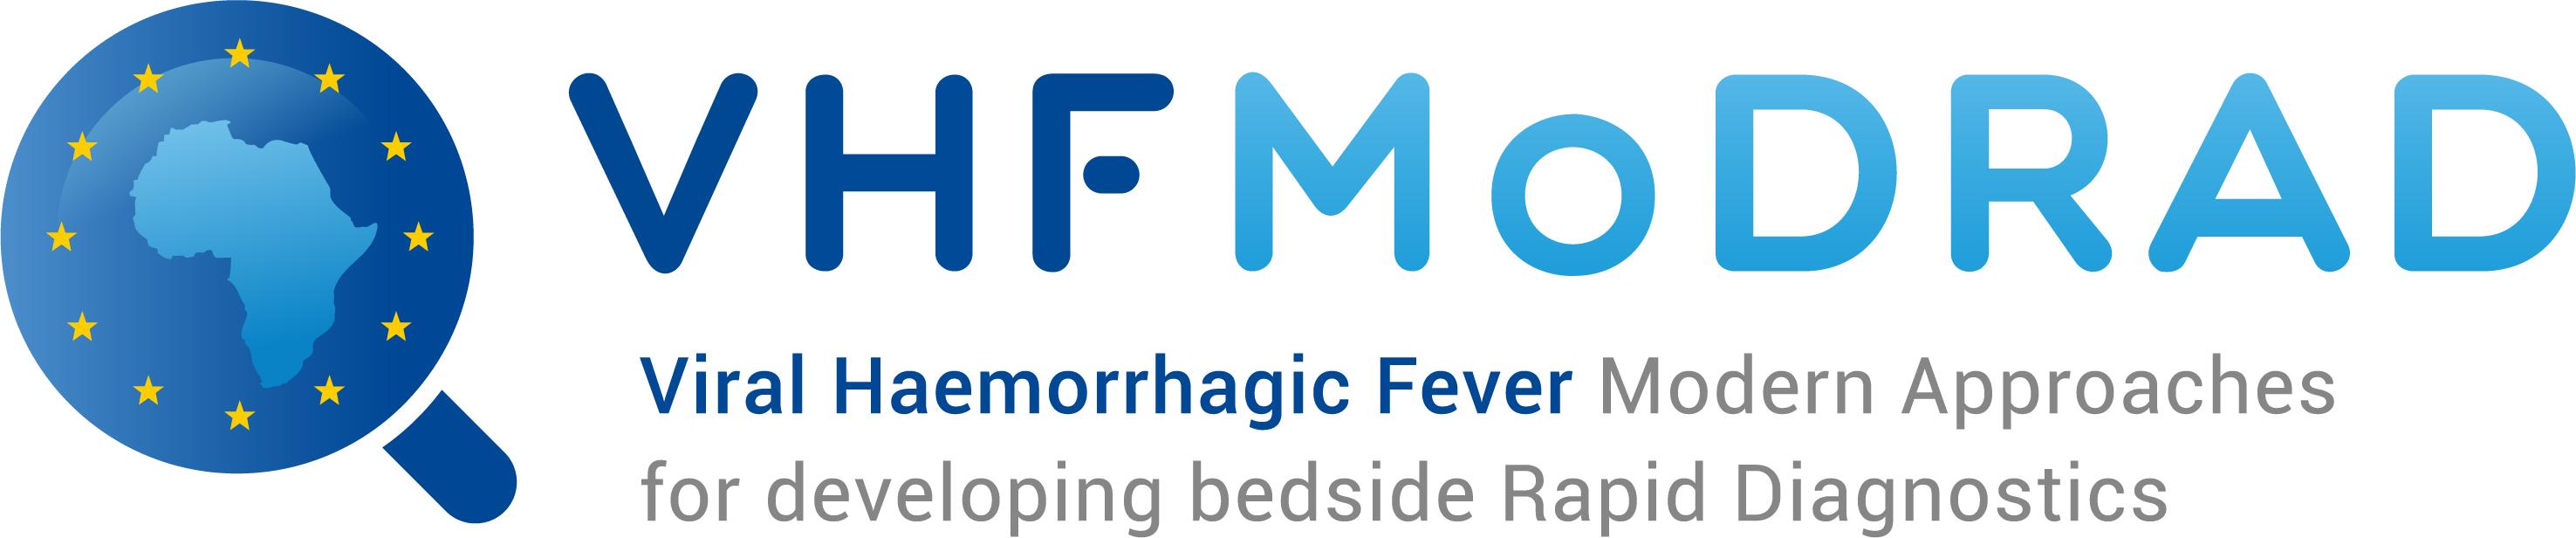 Viral Hemorrhagic Fever: Modern Approaches for developing bedside Rapid Diagnostics